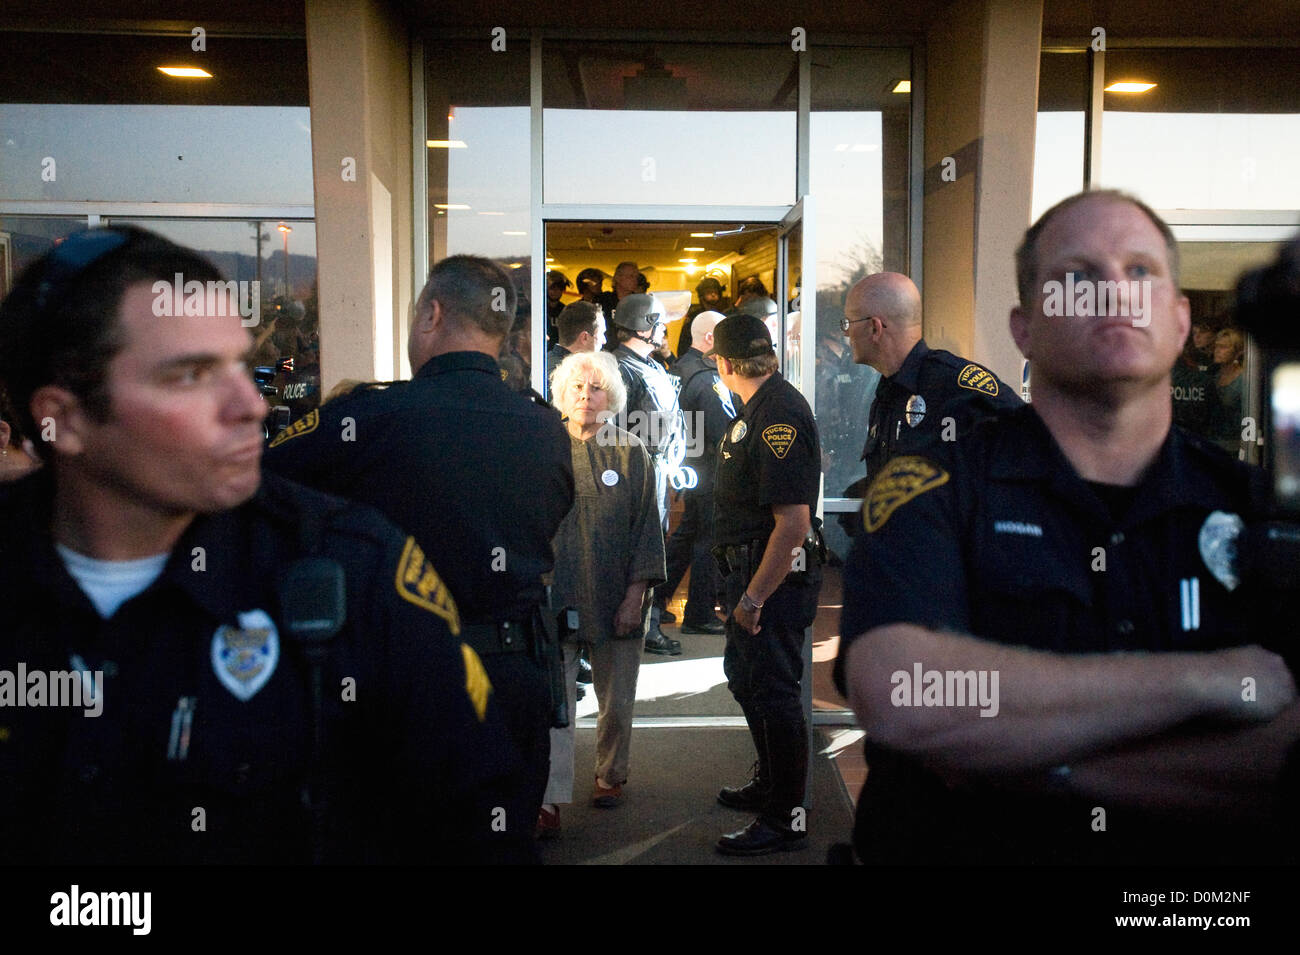 May 3 2011 Tucson Arizona U S Tucson Police Department Officers Escort